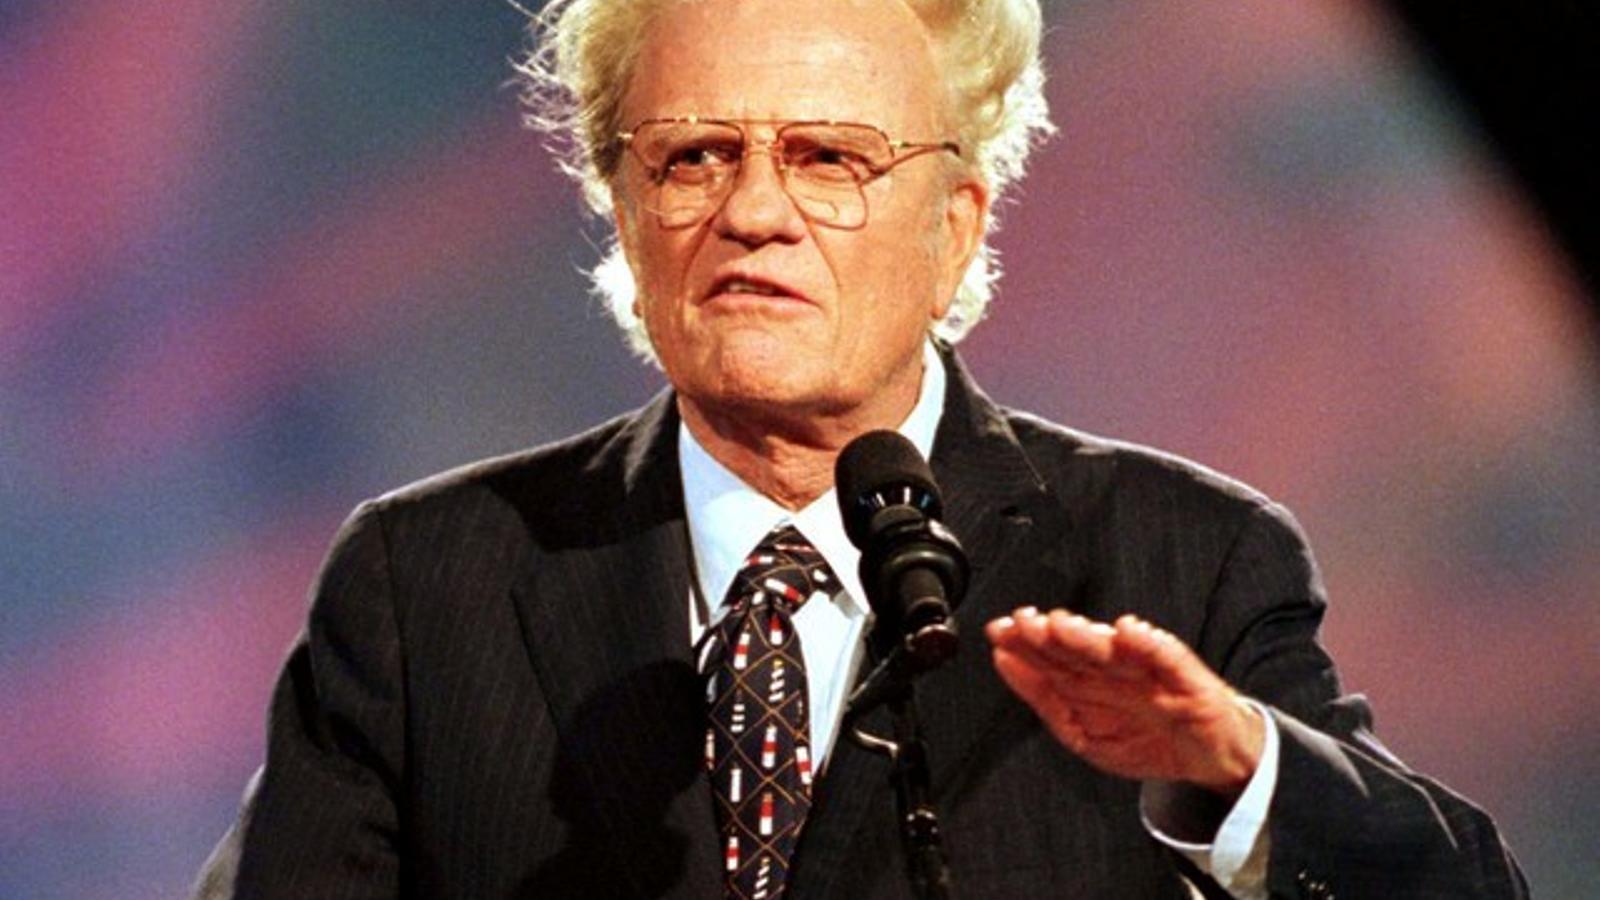 Mor l'influent televangelista dels EUA Billy Graham